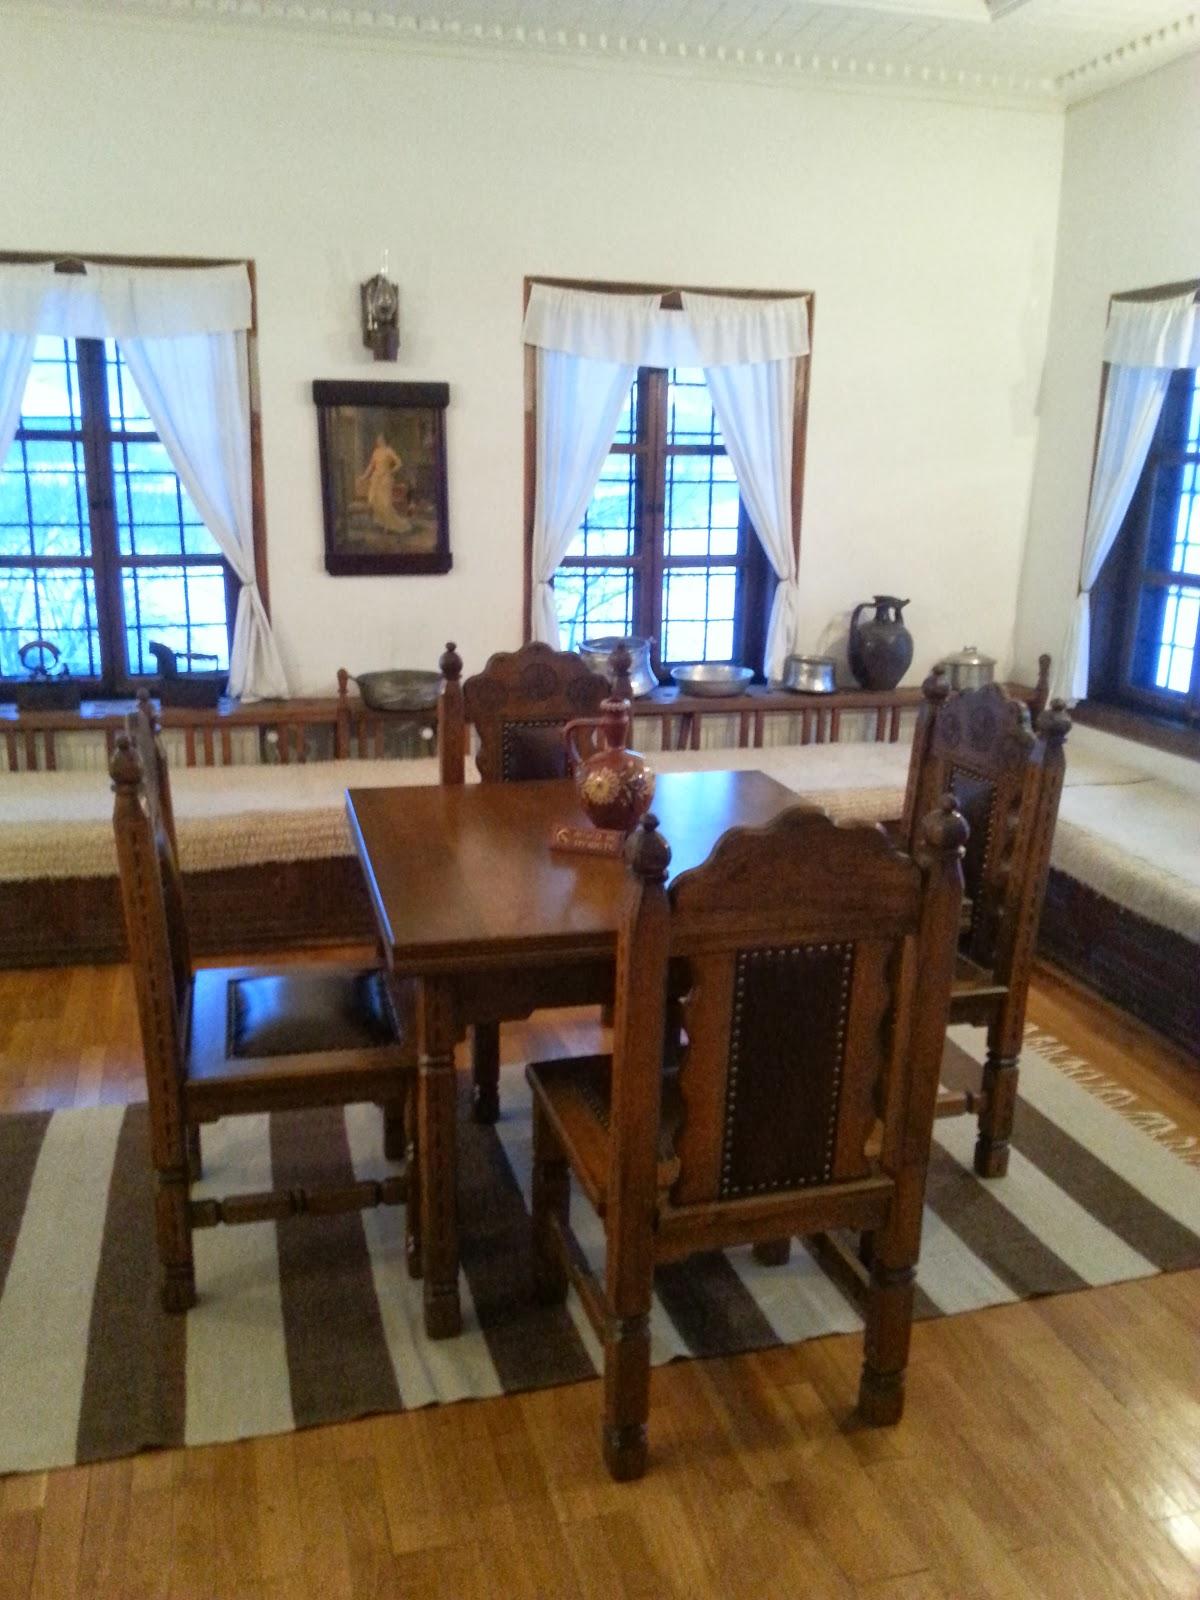 Arbanashki han meeting room